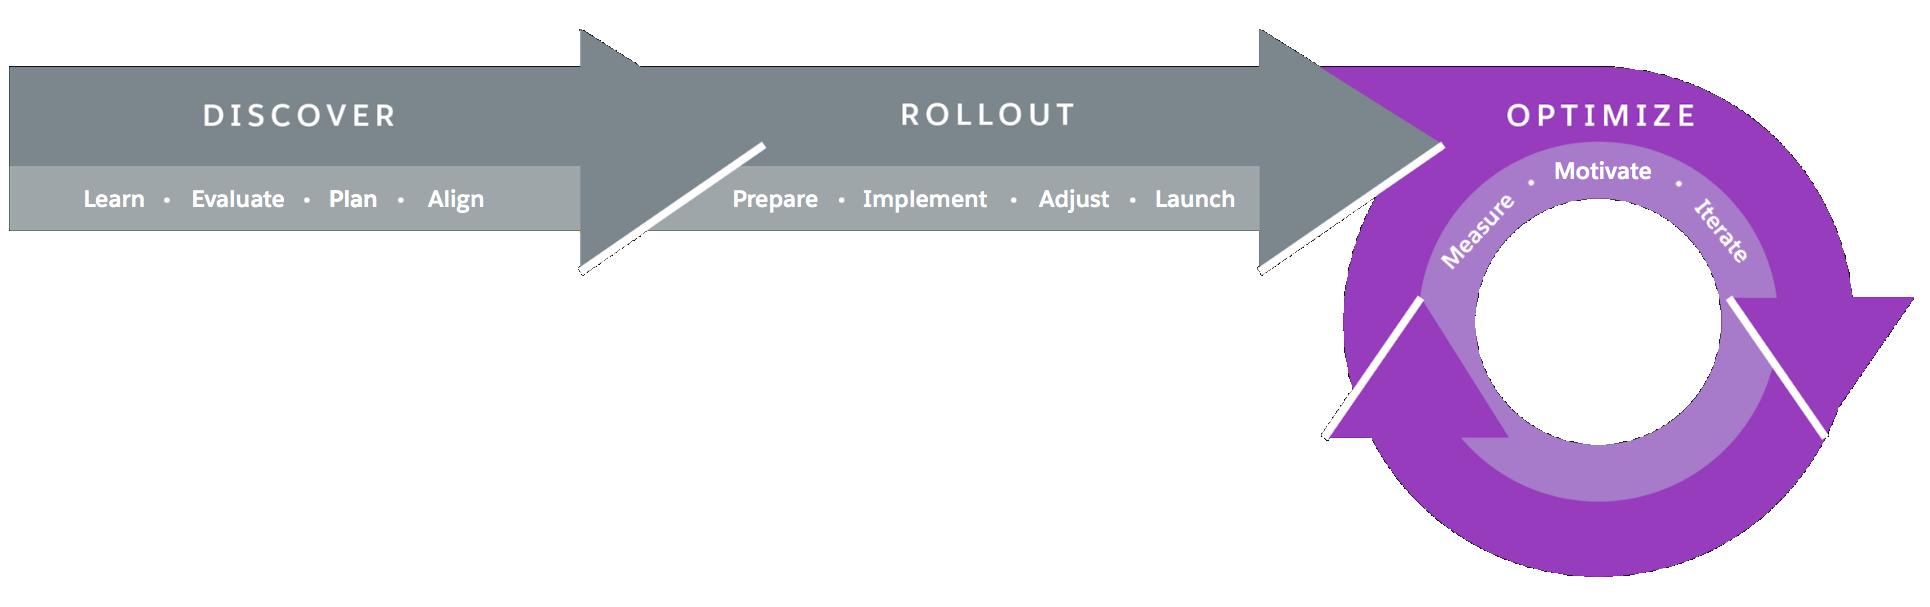 Lightning Experience の移行のフレームワークの視覚表示。最適化フェーズが強調表示されています。